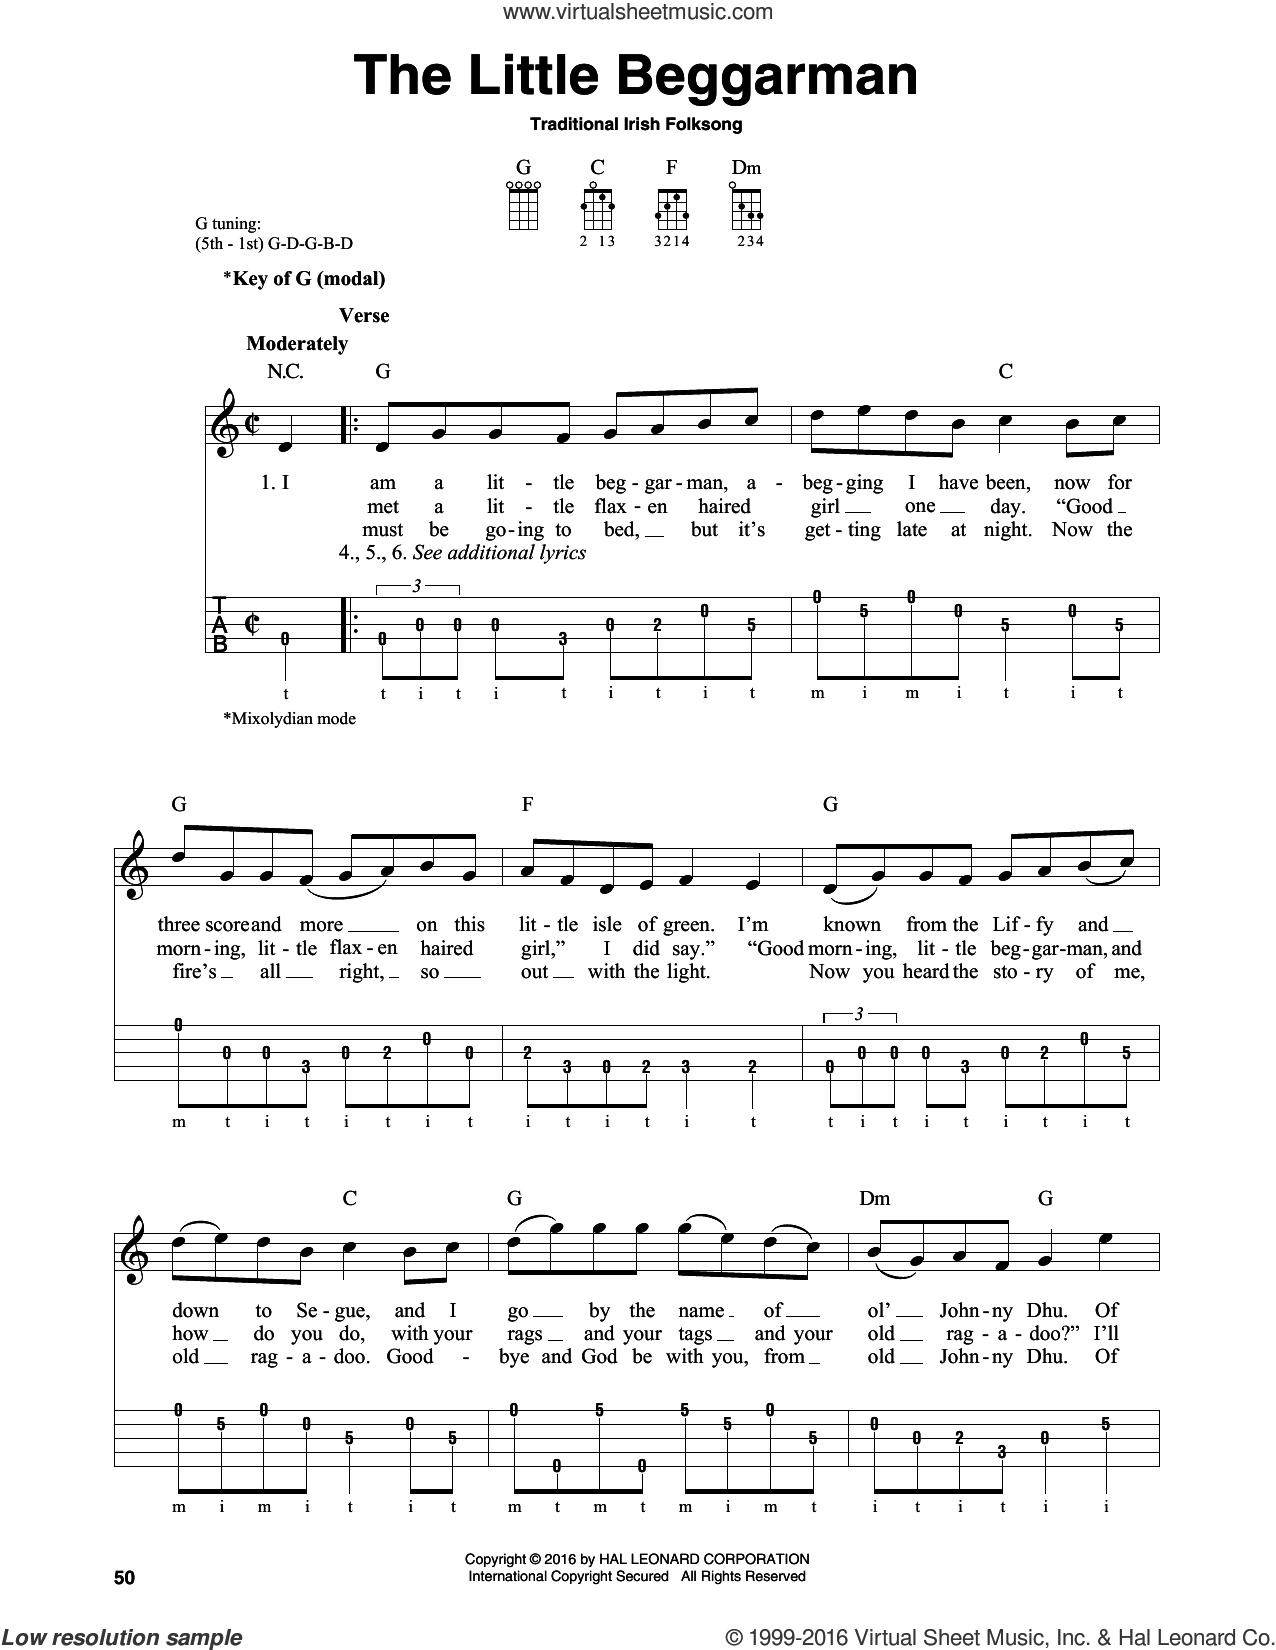 The Little Beggarman sheet music for banjo solo, intermediate skill level